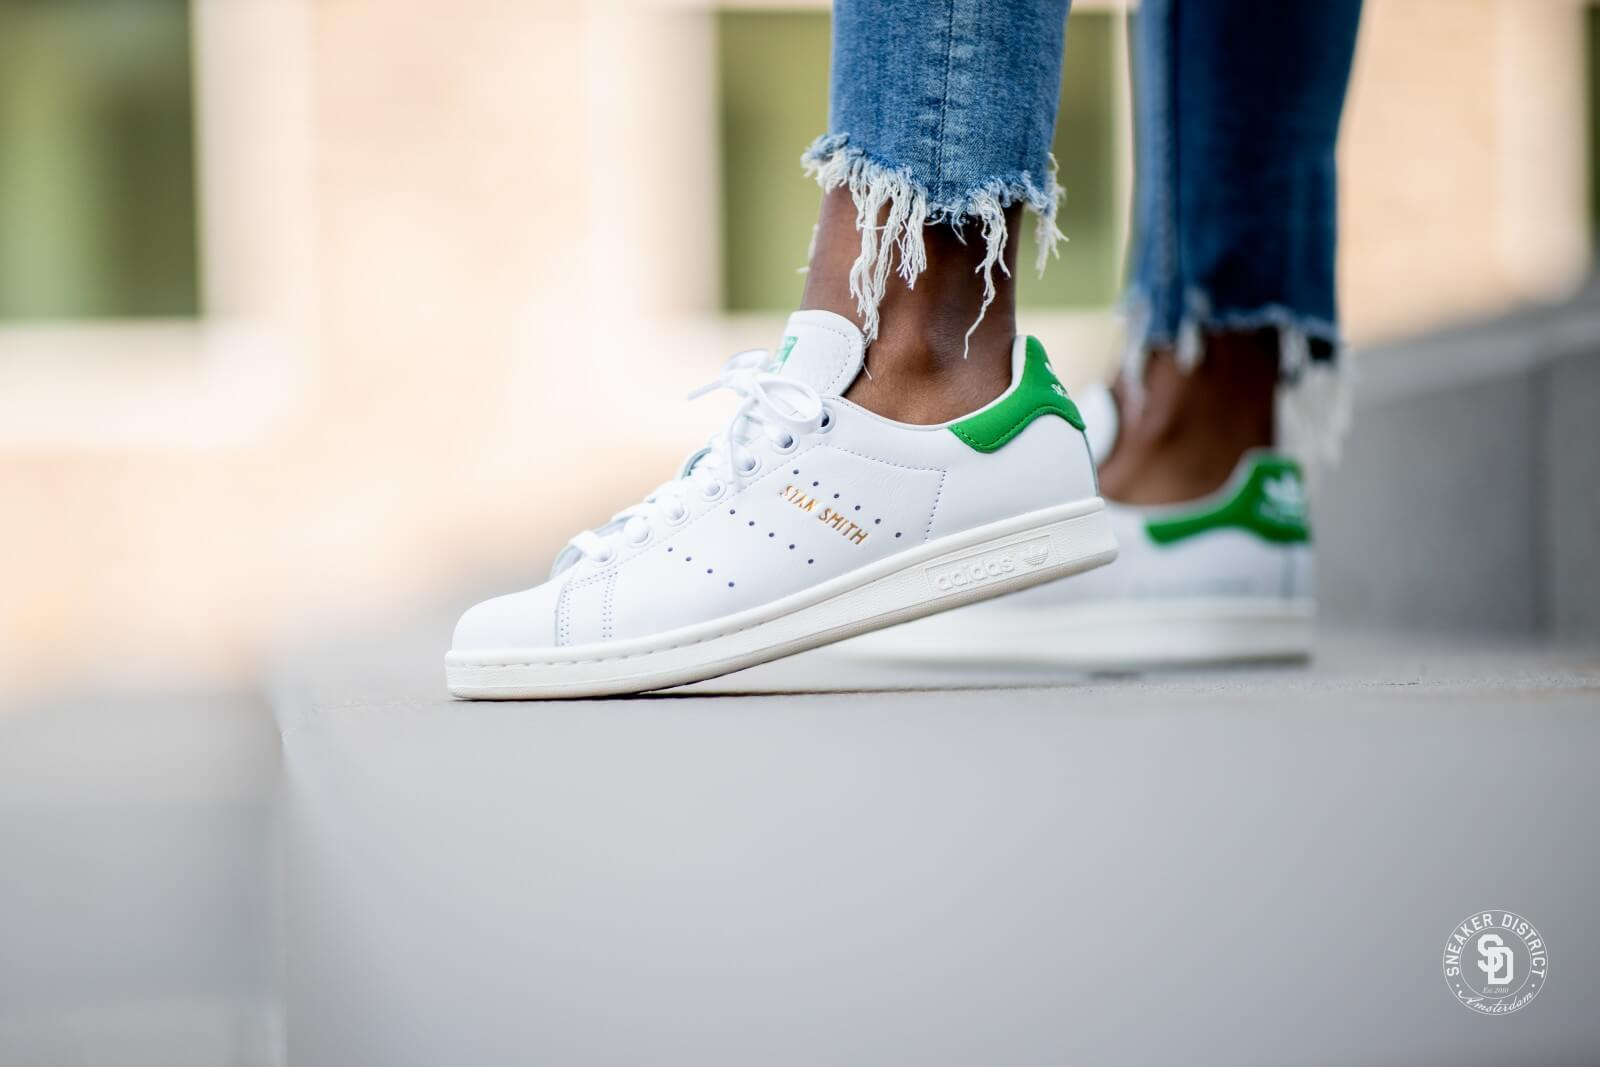 Adidas Stan Smith Footwear WhiteFootwear White Green EF7508